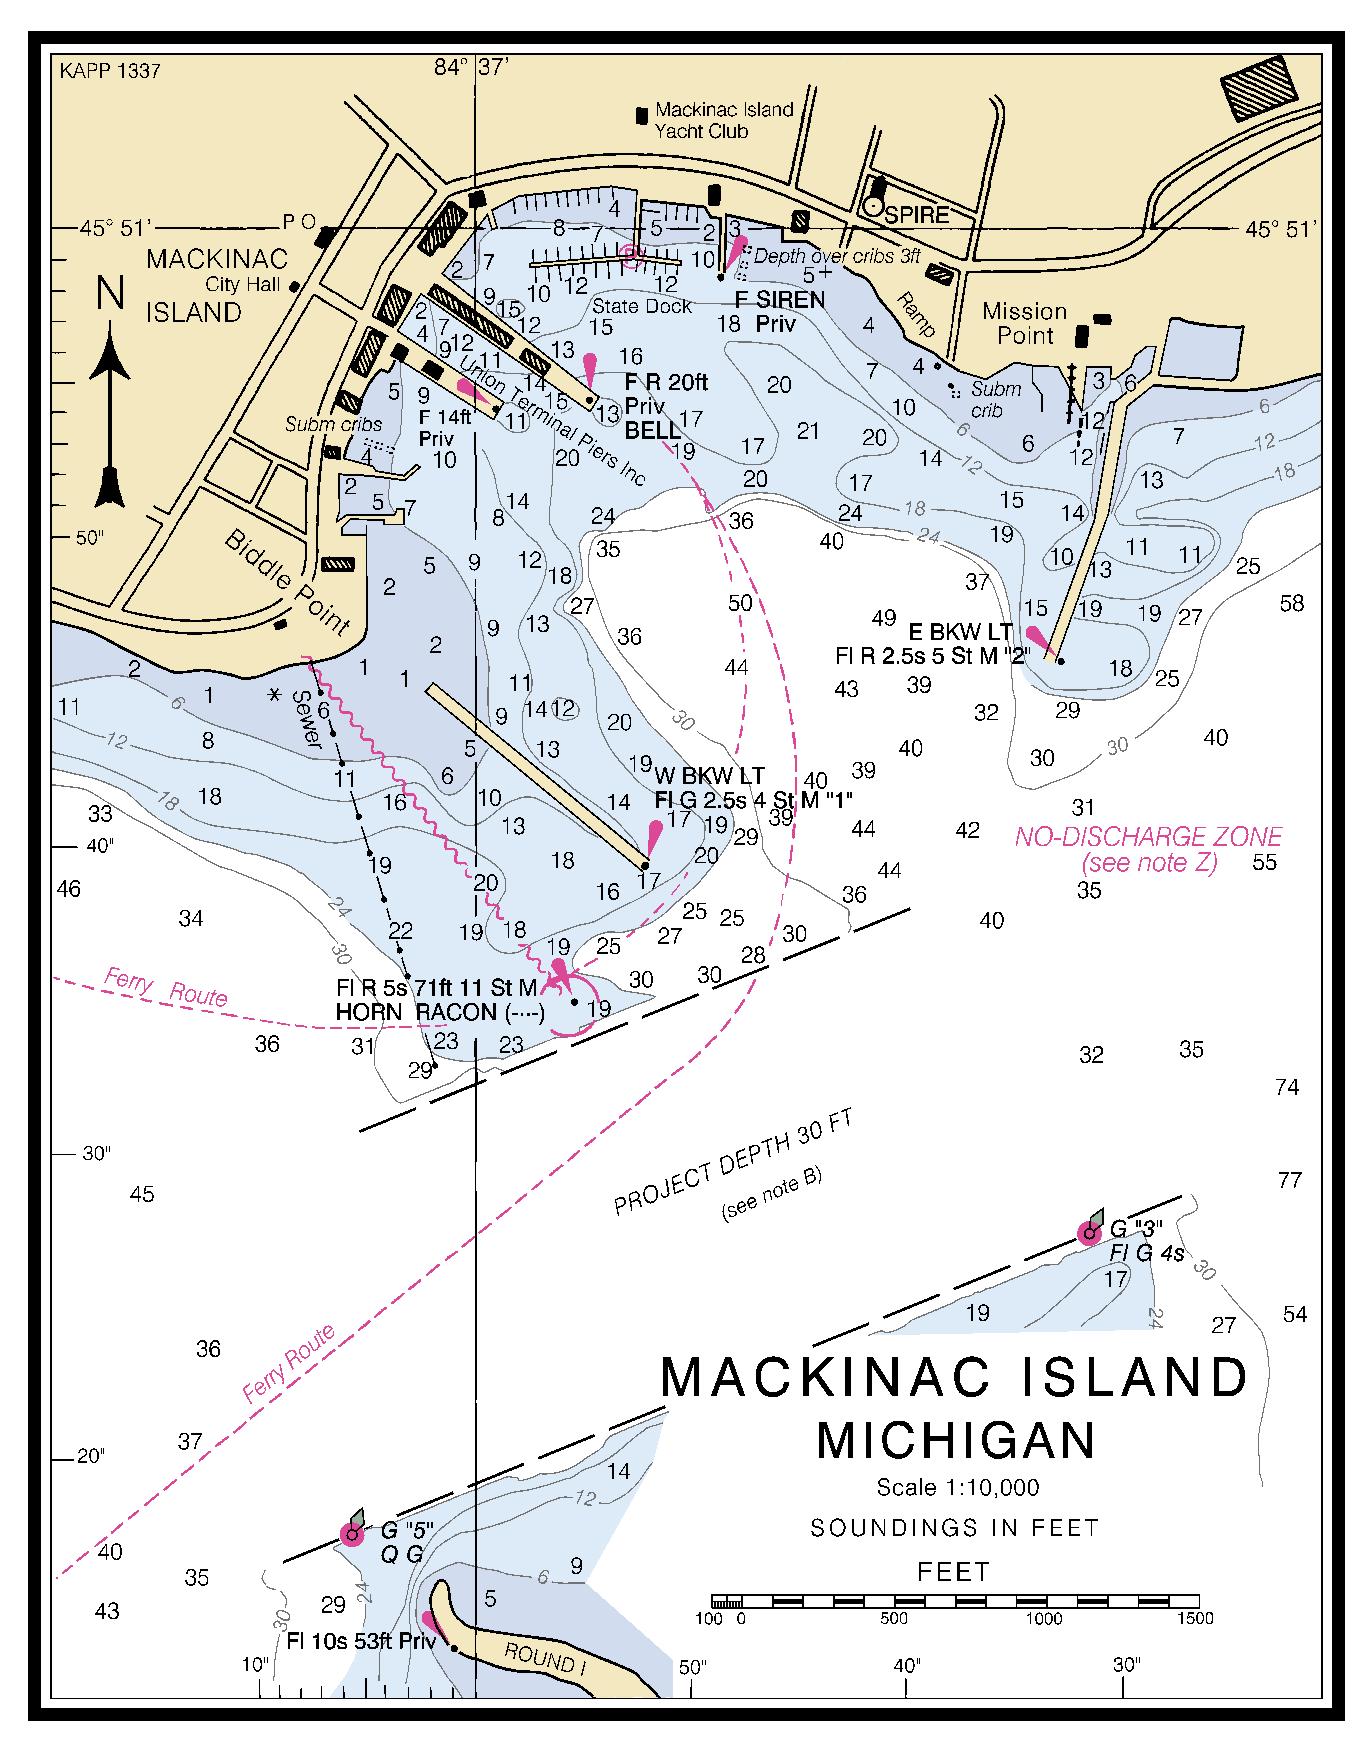 MACKINAC ISLAND MICHIGAN Nautical Chart   Charts  Maps